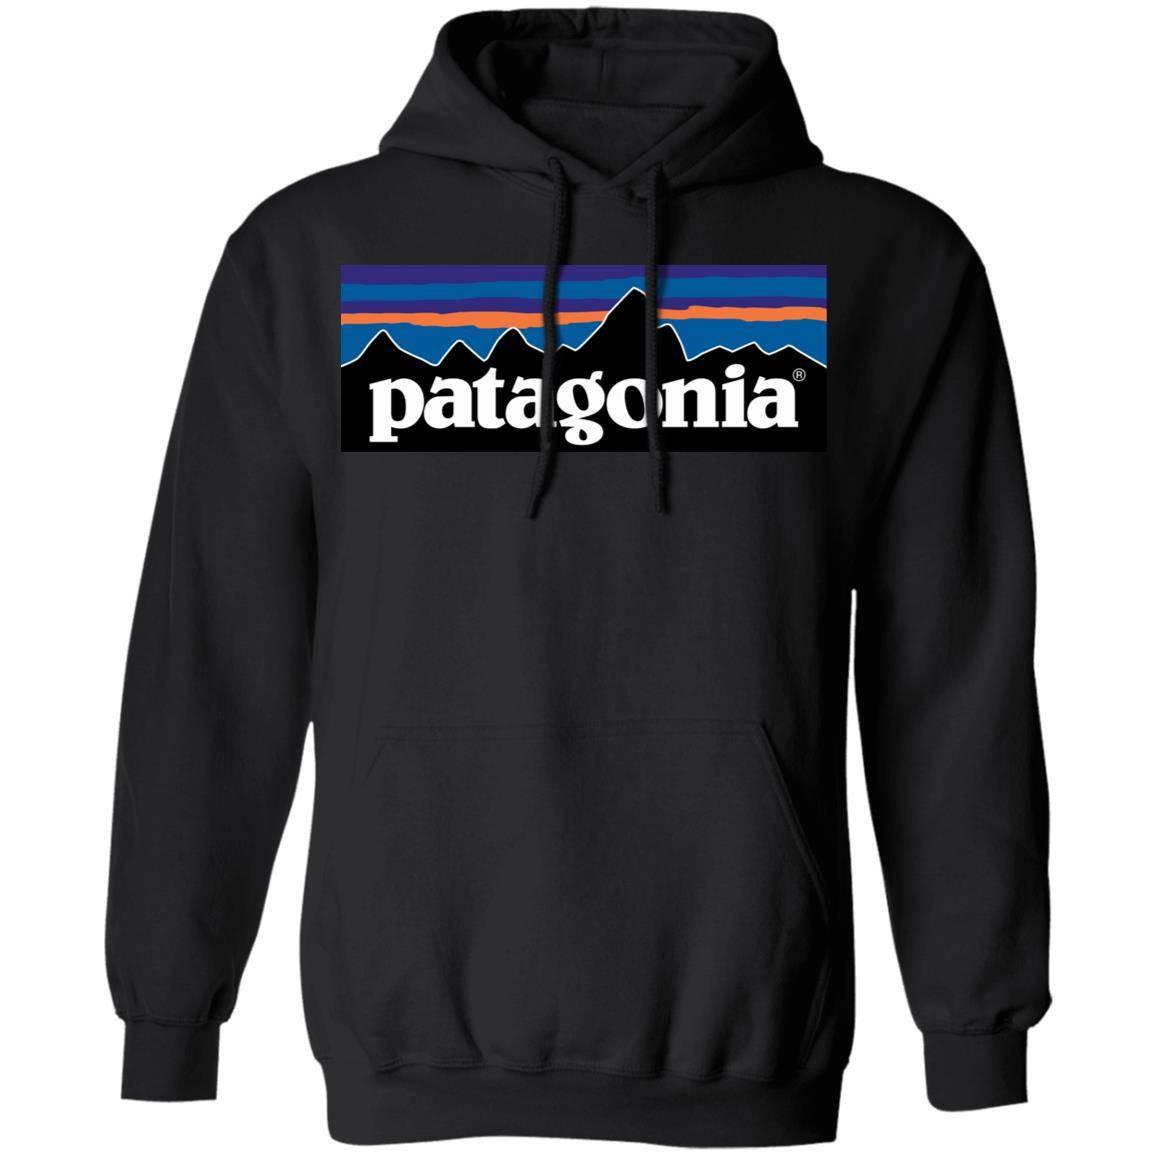 Patagonia – Hoodie for Men, Women